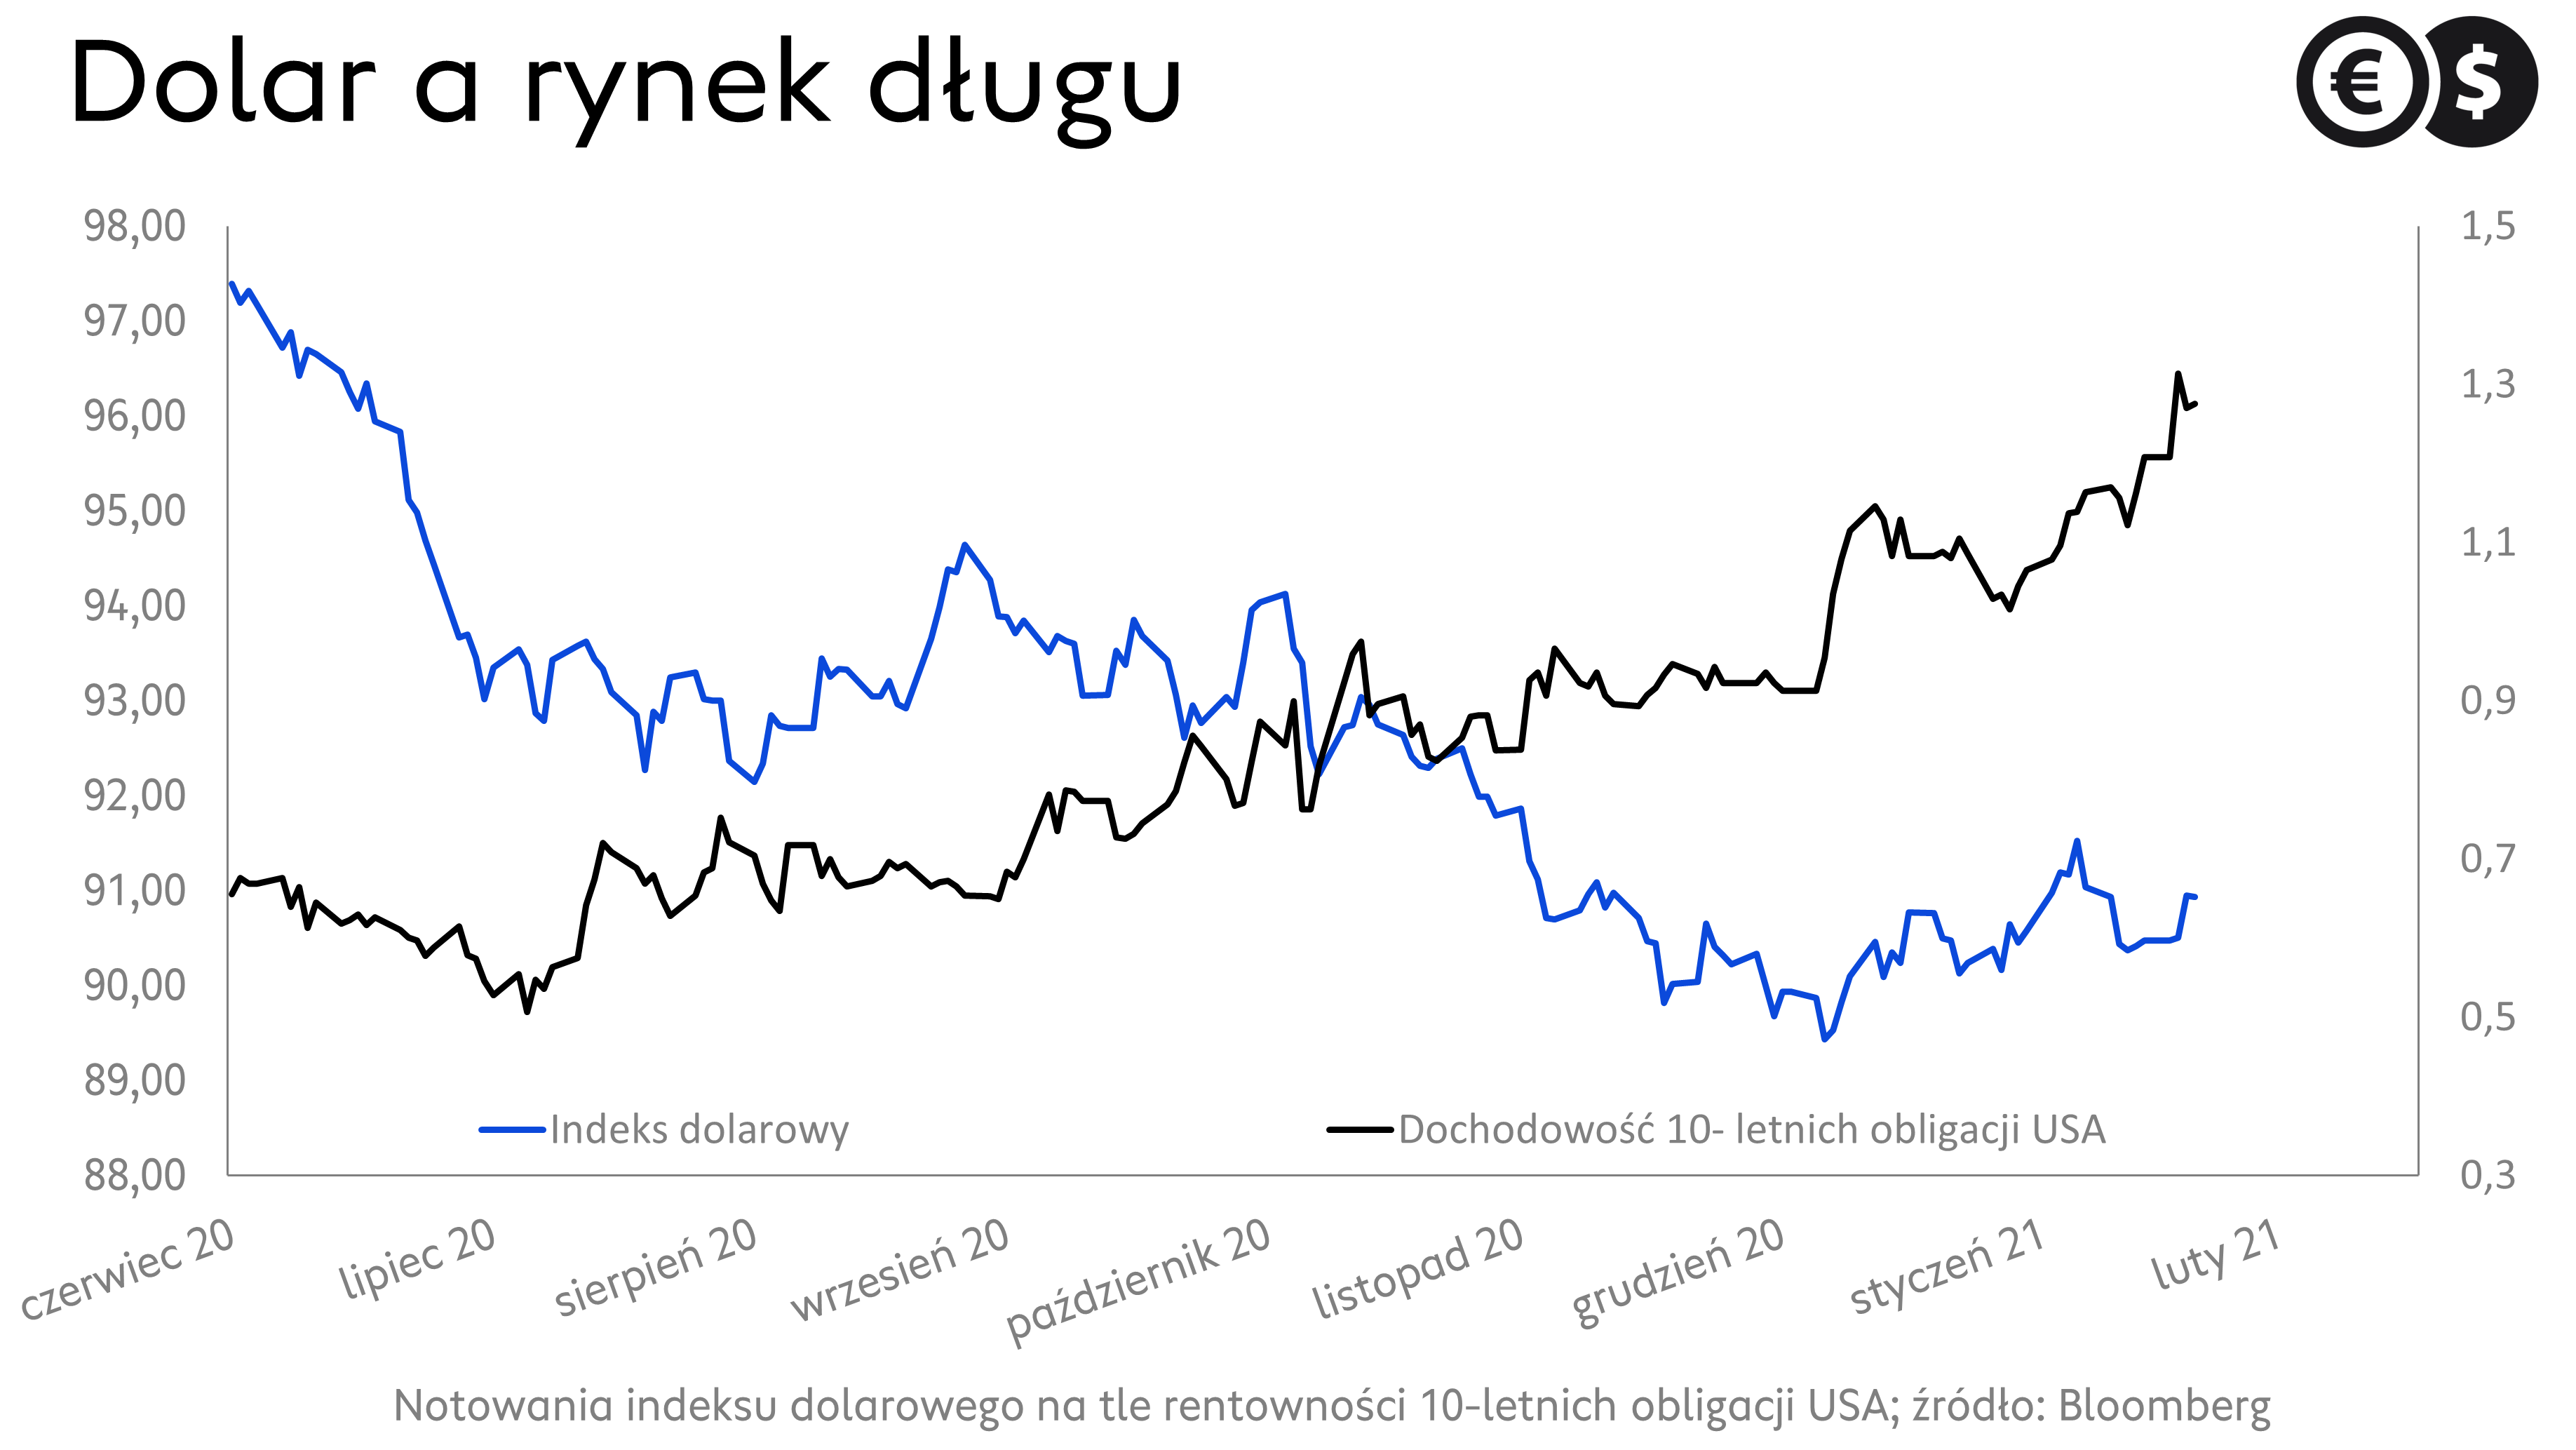 Dolar a rynek długu